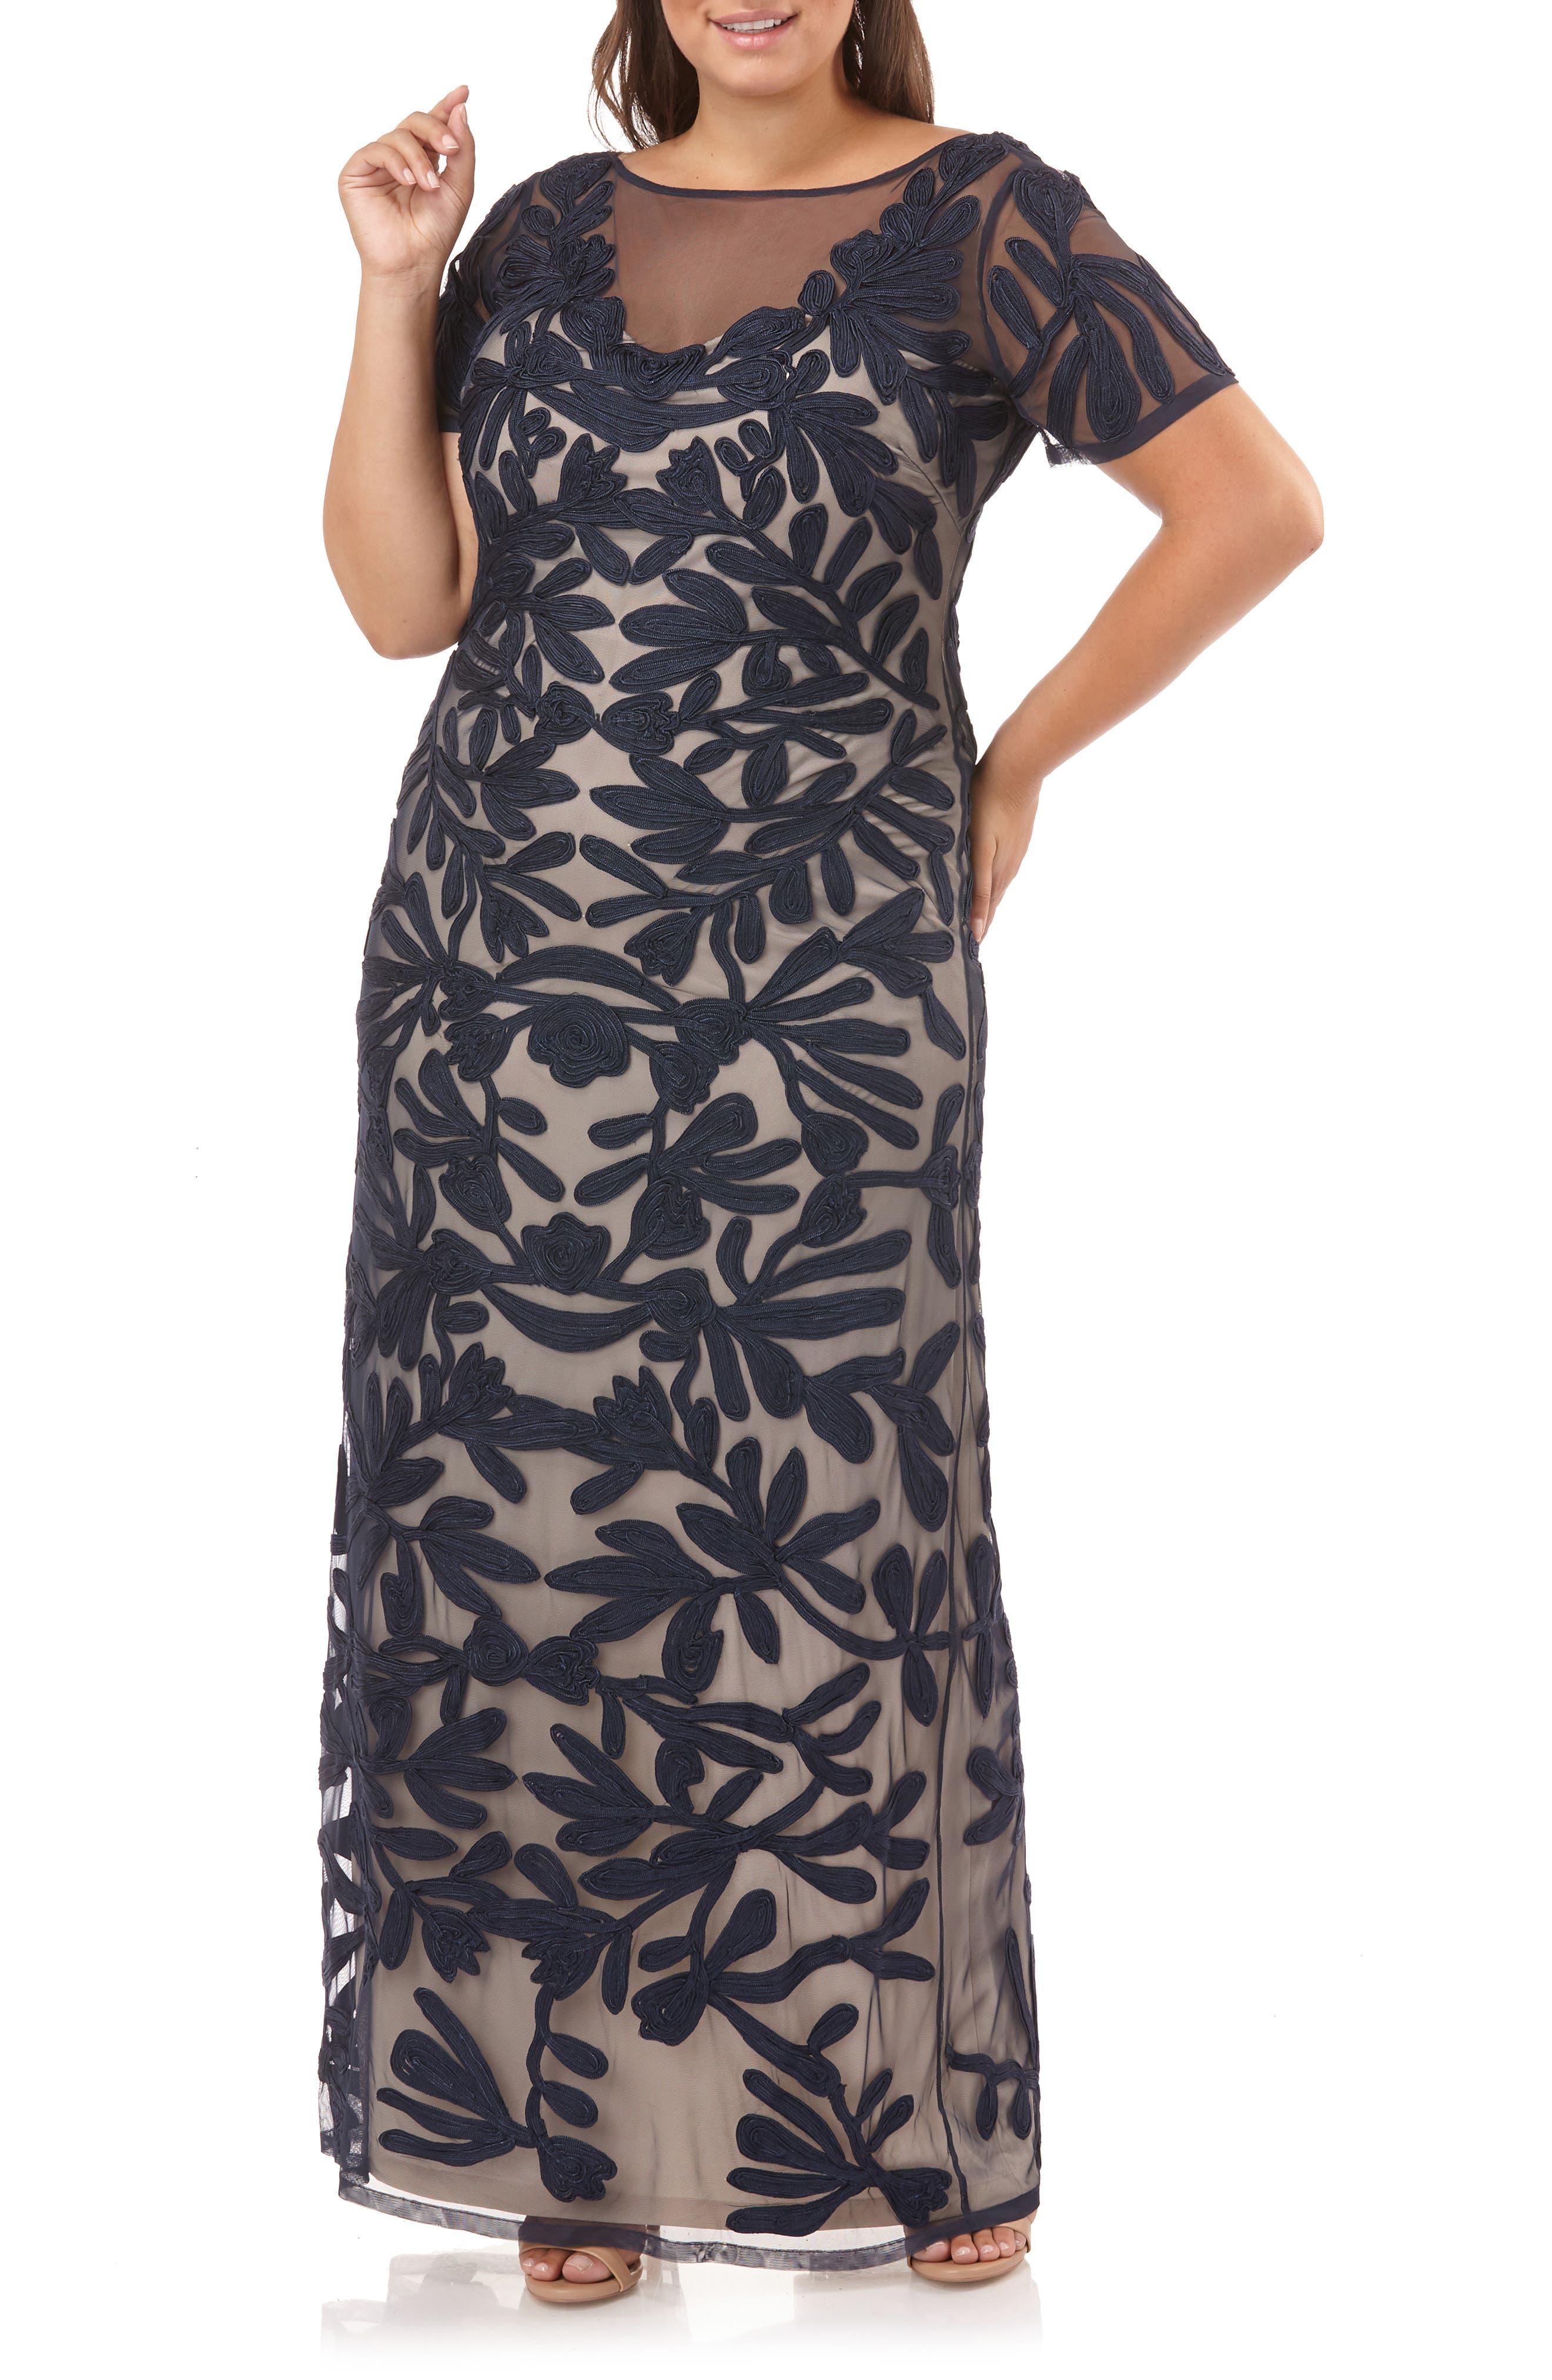 JS COLLECTIONS,                             Illusion Soutache Evening Dress,                             Alternate thumbnail 6, color,                             NAVY/ NUDE